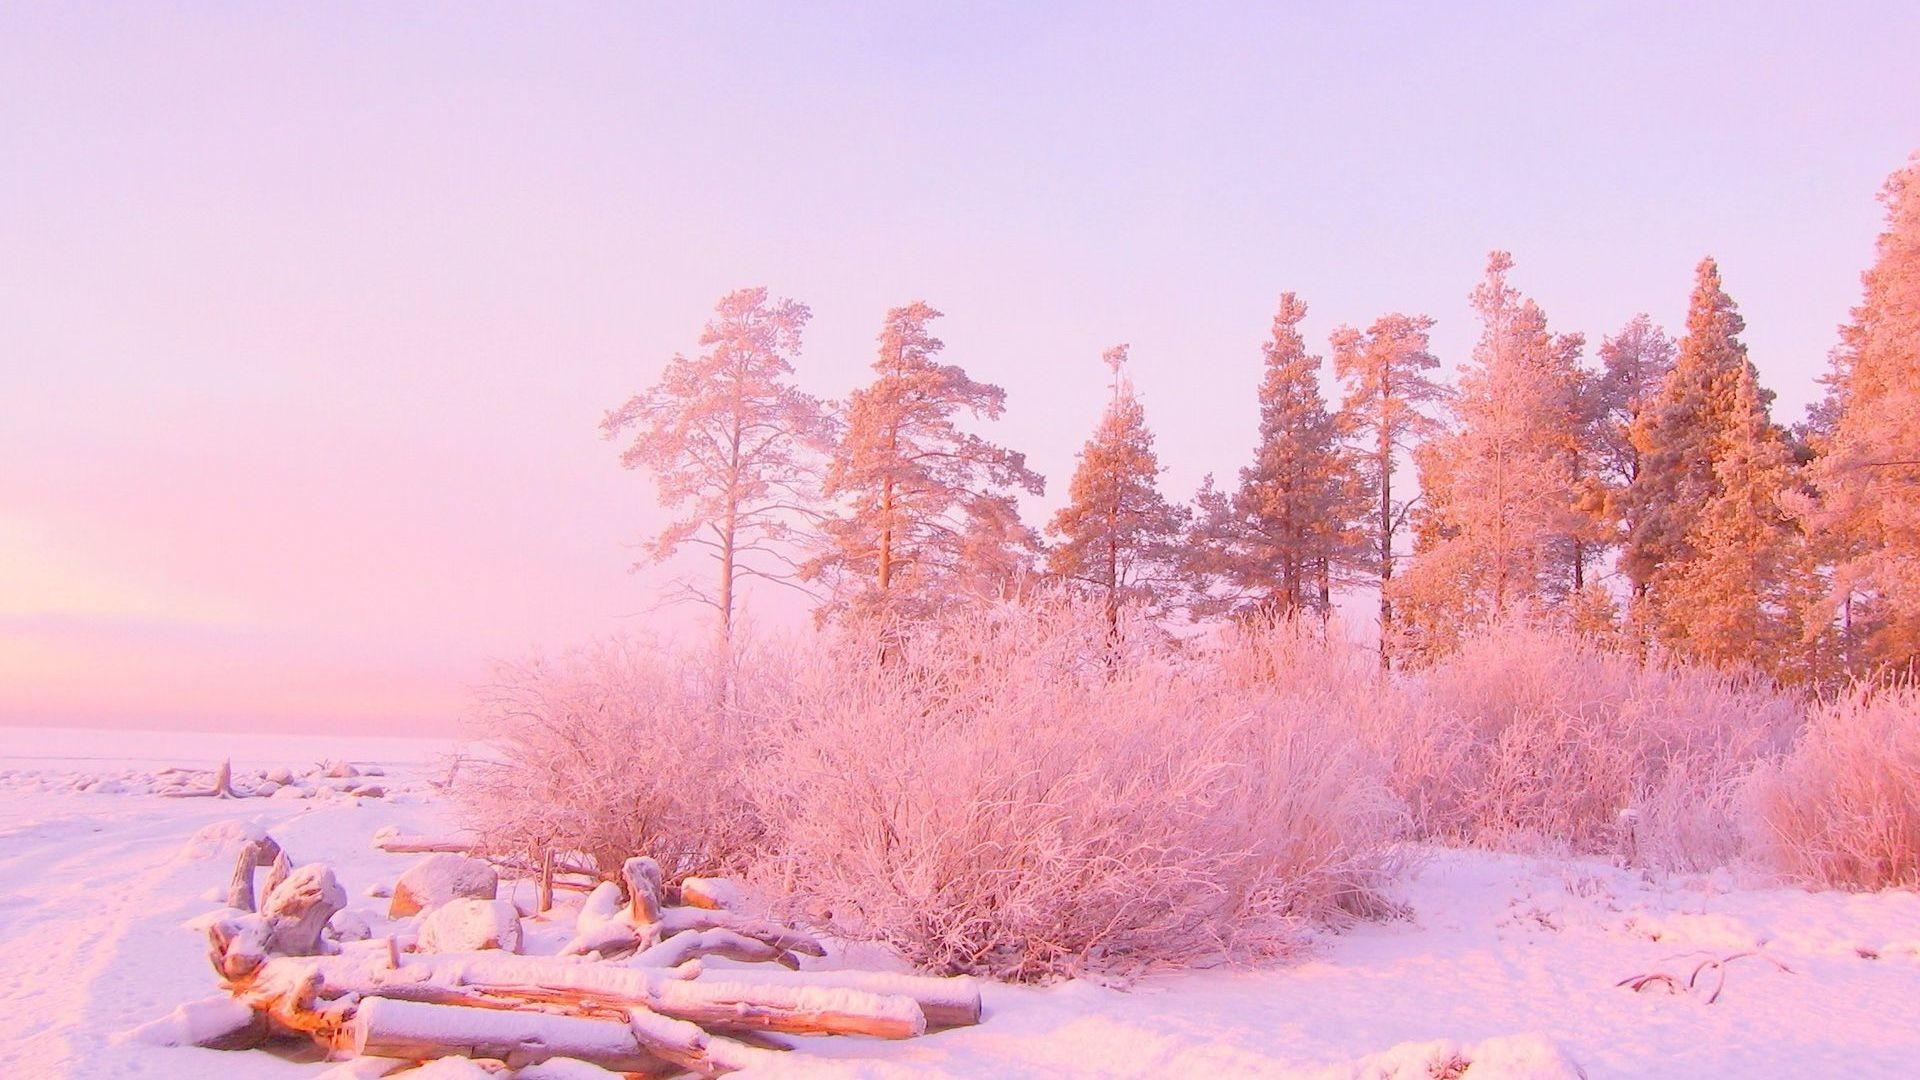 Hd Light Pink Backgrounds Background Photos 1080p Smart